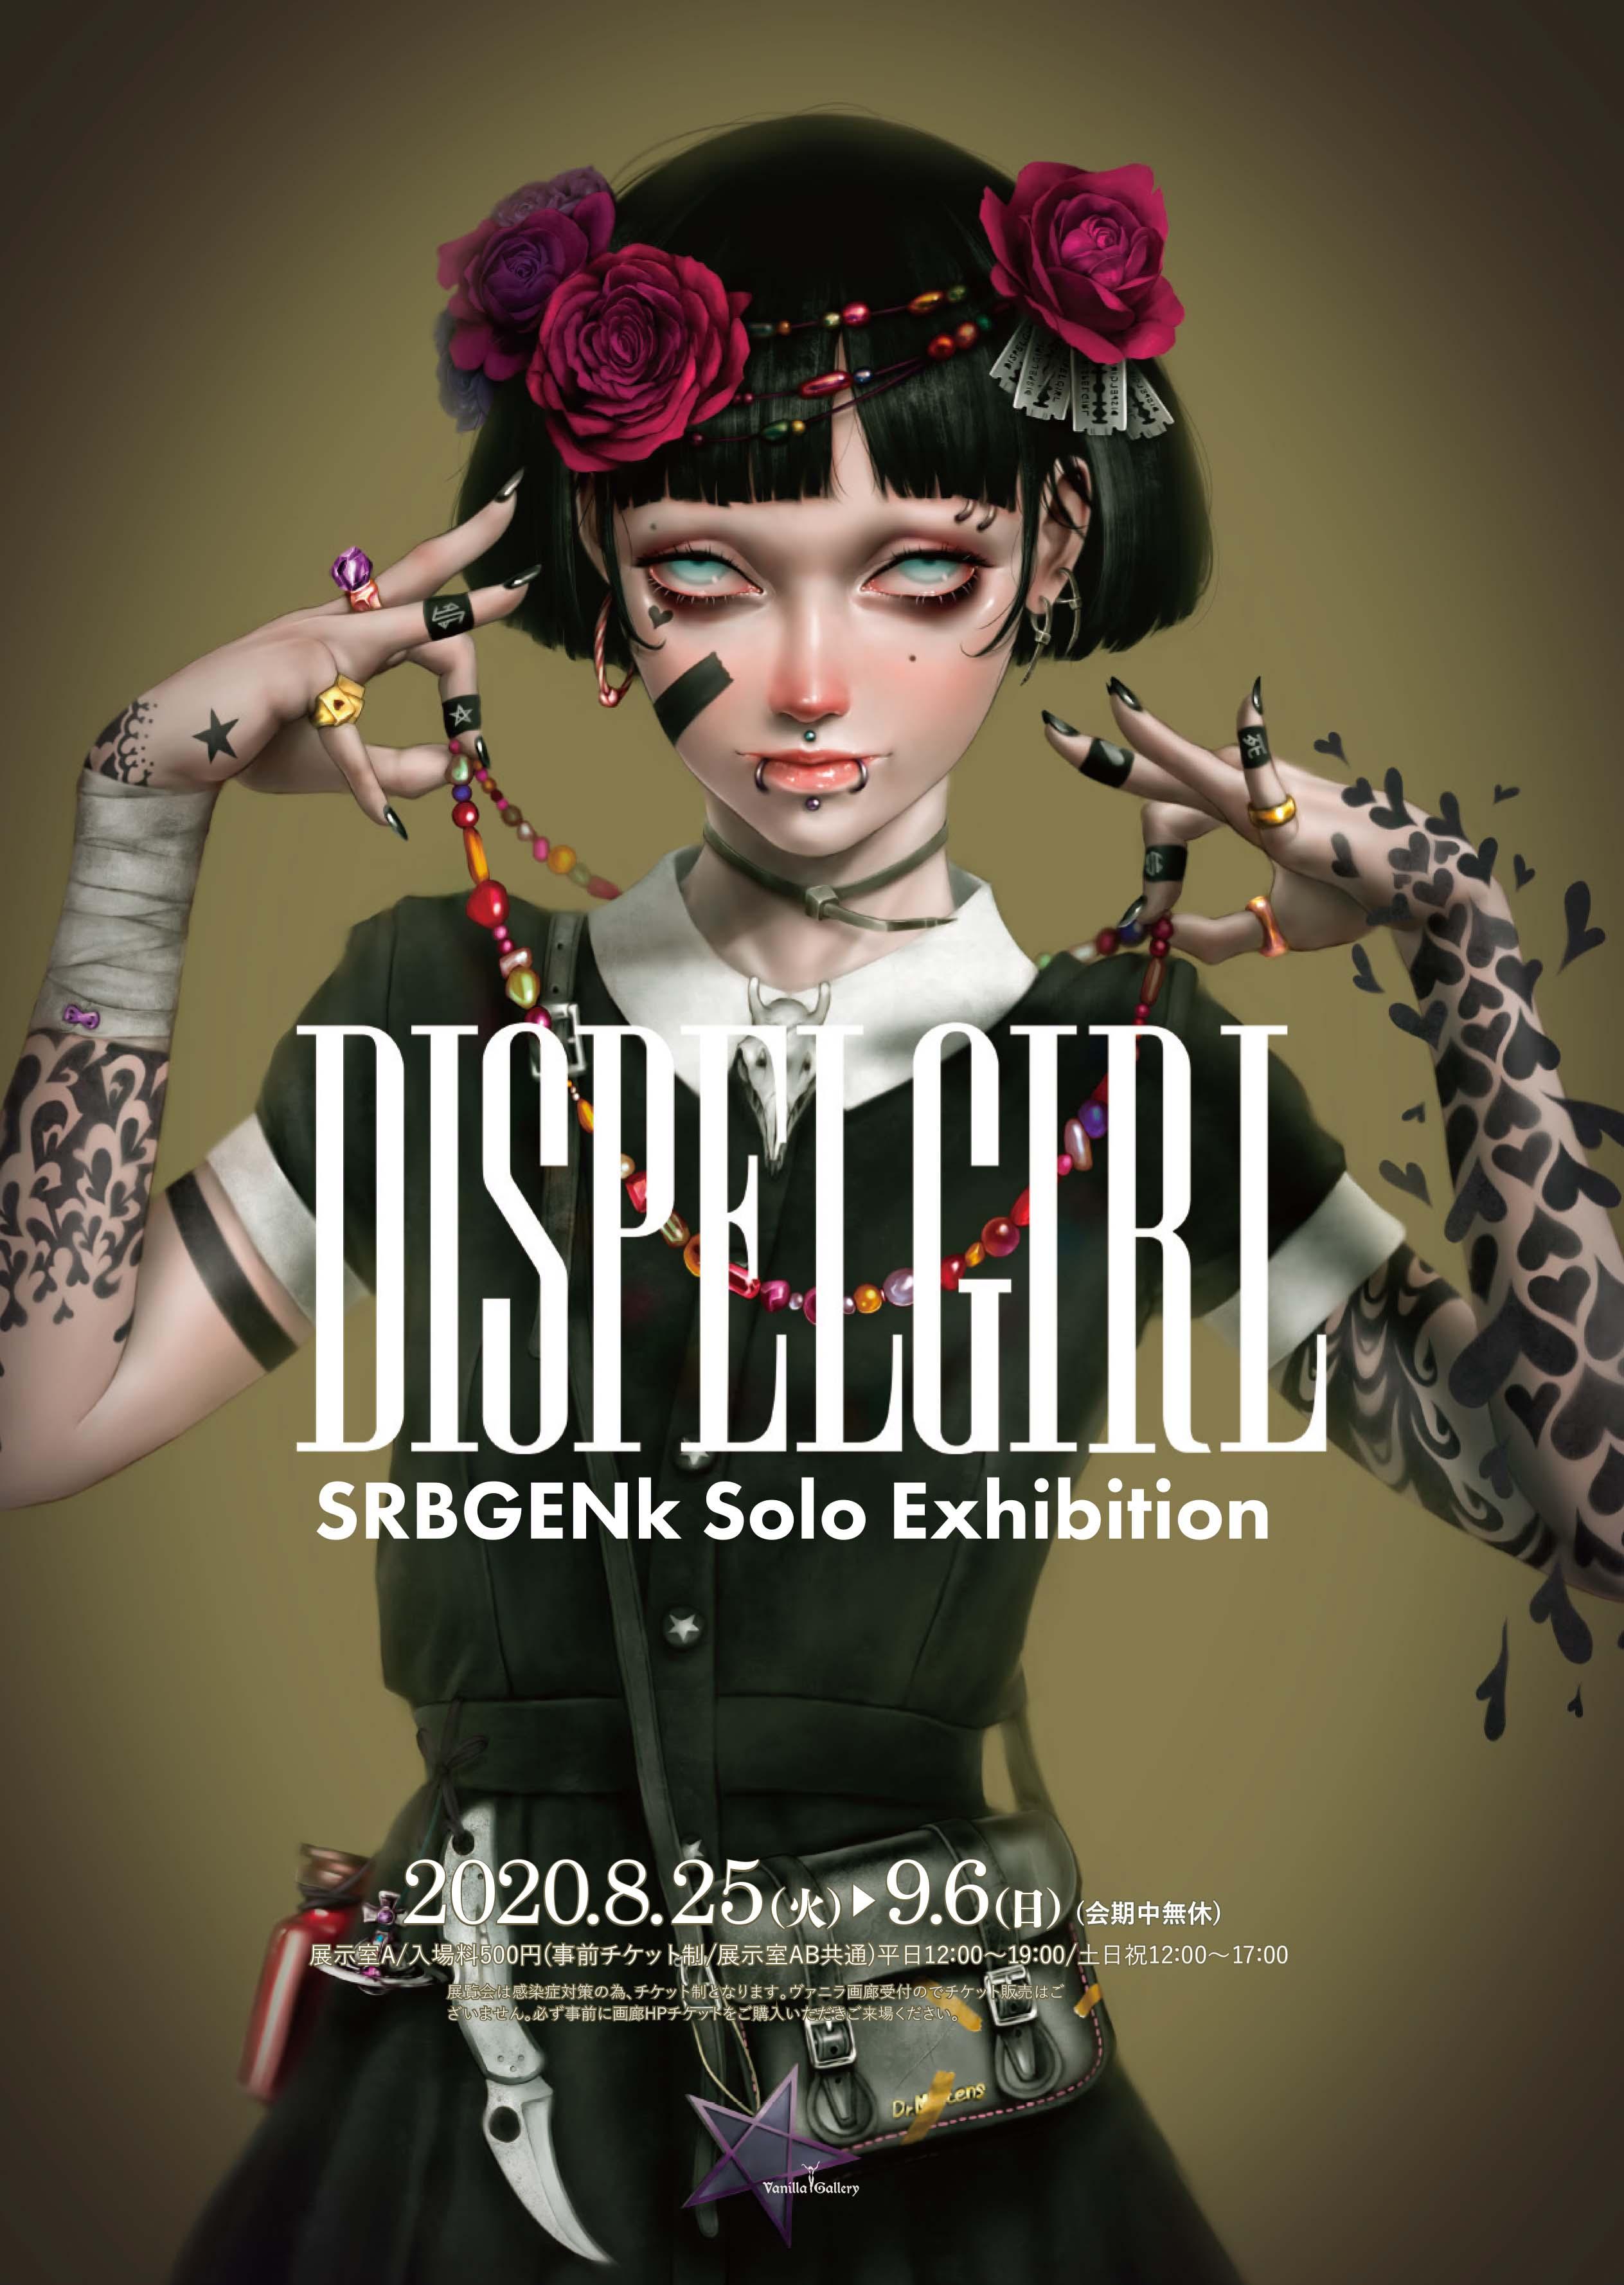 SRBGENk個展「DISPELGIRL」/キジメッカ作品展「キジメッ禍2020」 9月6日チケット